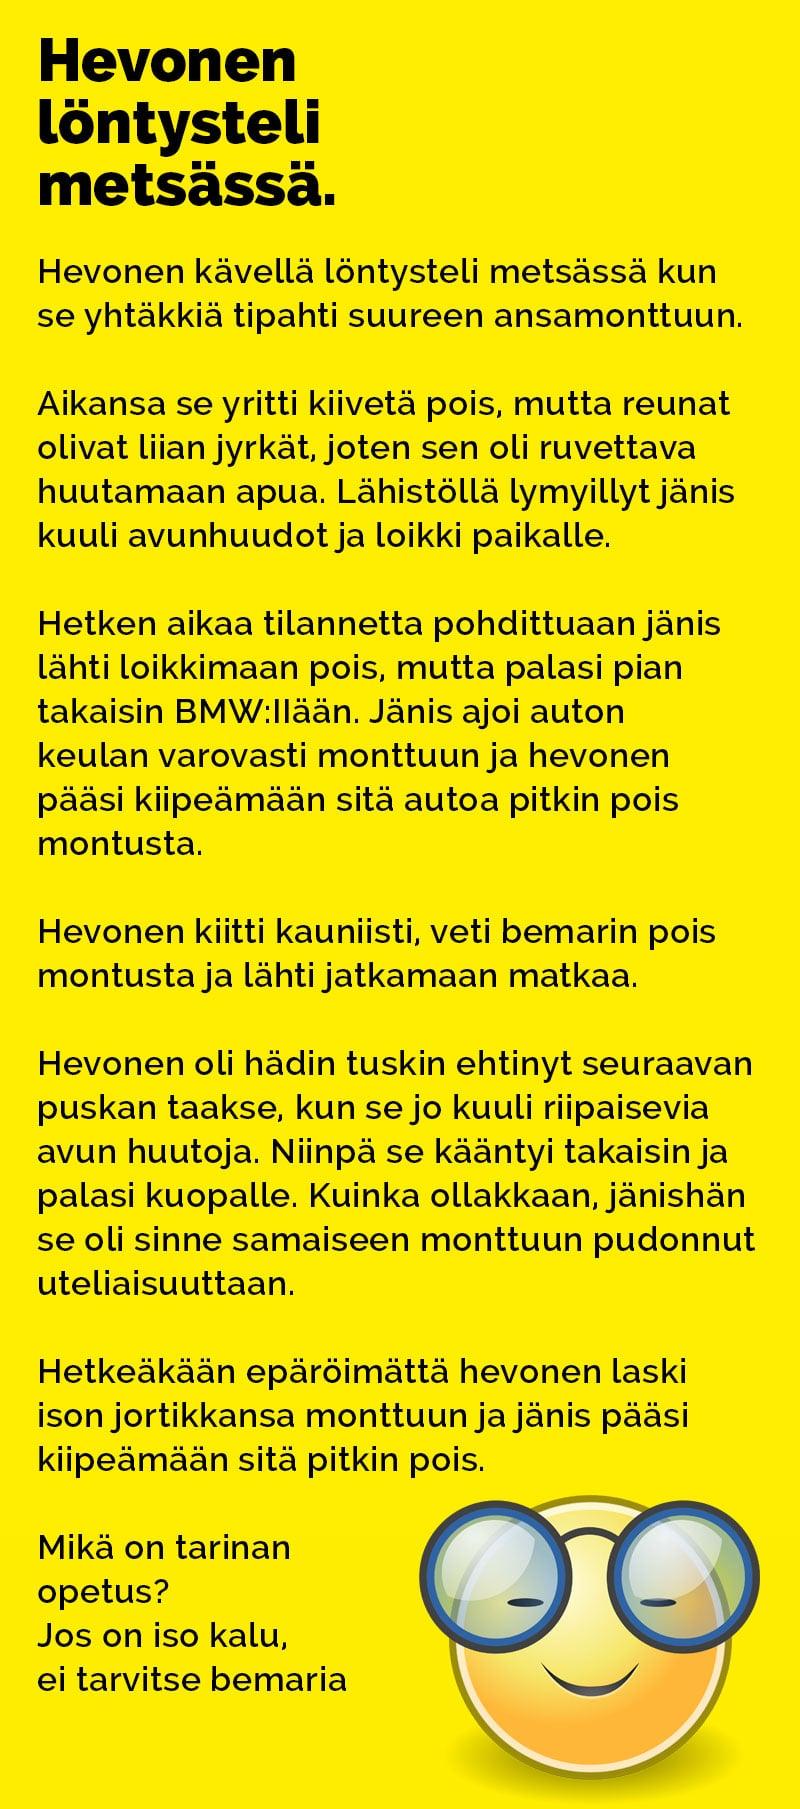 hevonen_lontysteli_metsassa_2